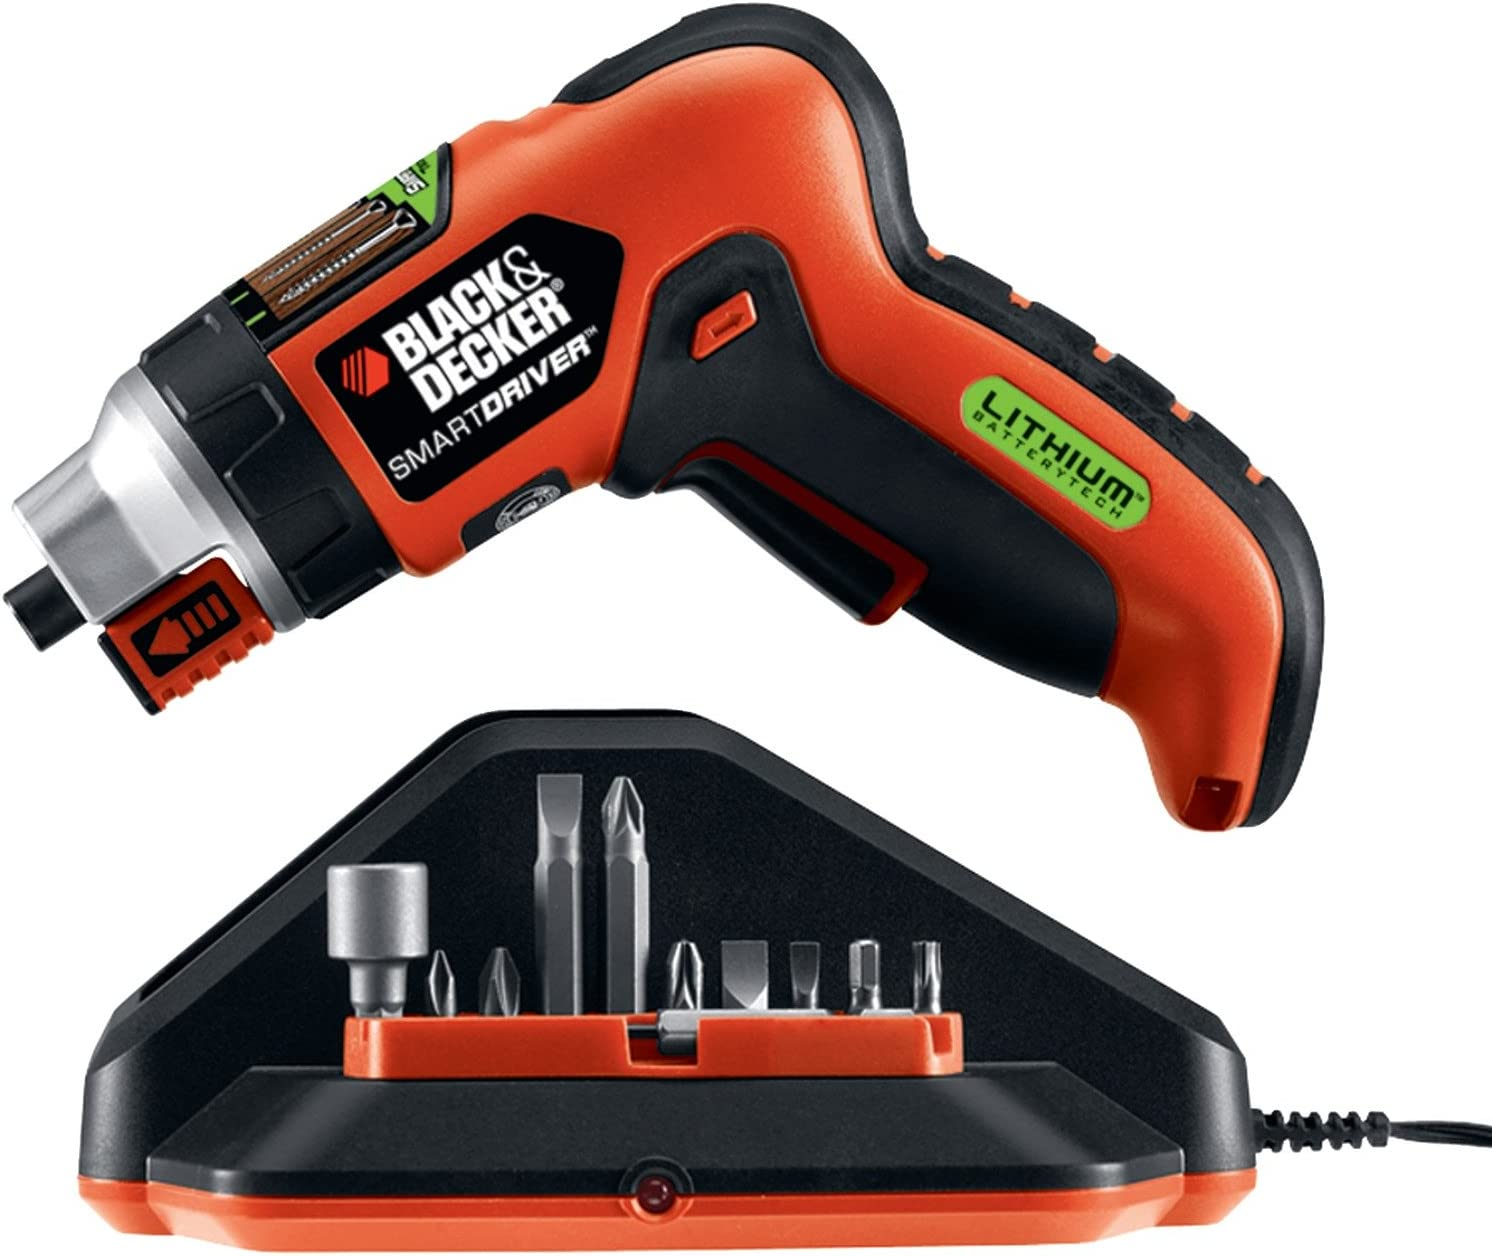 Black & Decker LI4000 Lithium Power Screwdriver W/Screw Holder & LED Worklight Tools , Hand Tools